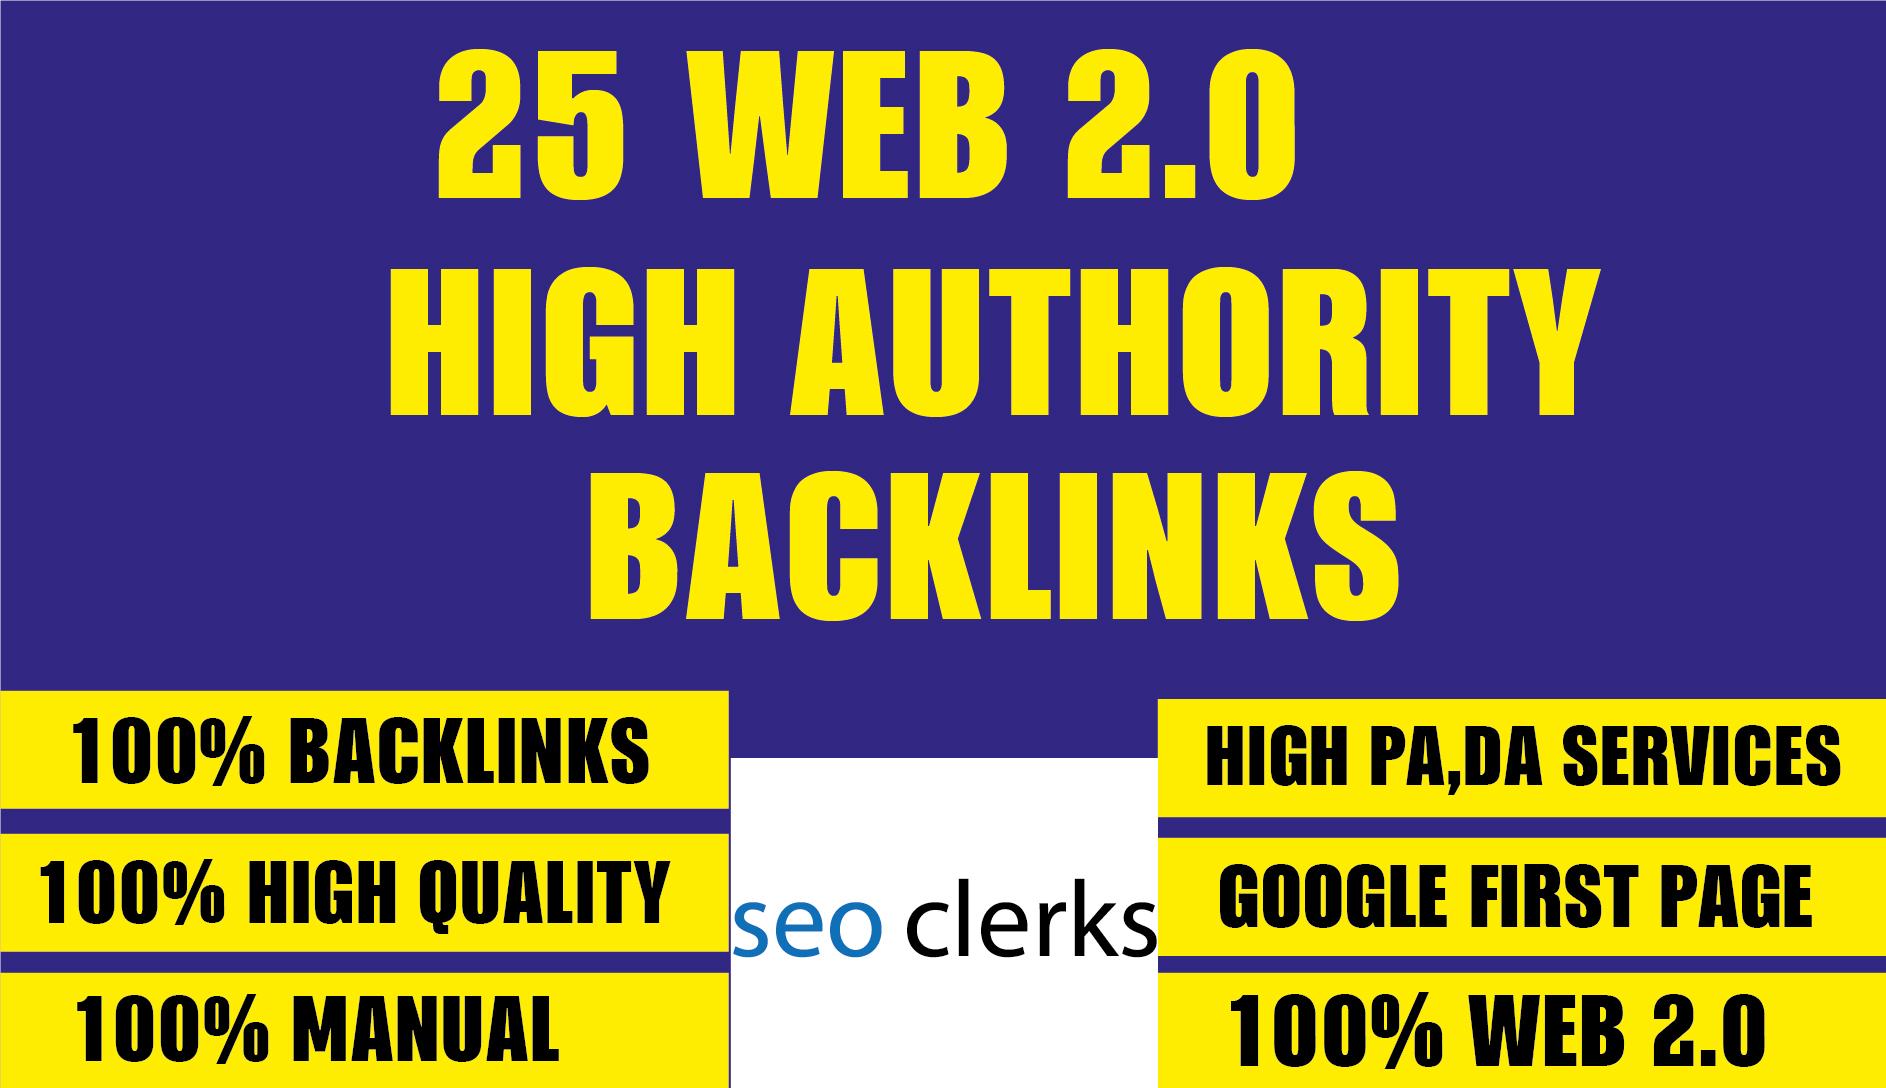 25 web 2 0 high authority backlinks